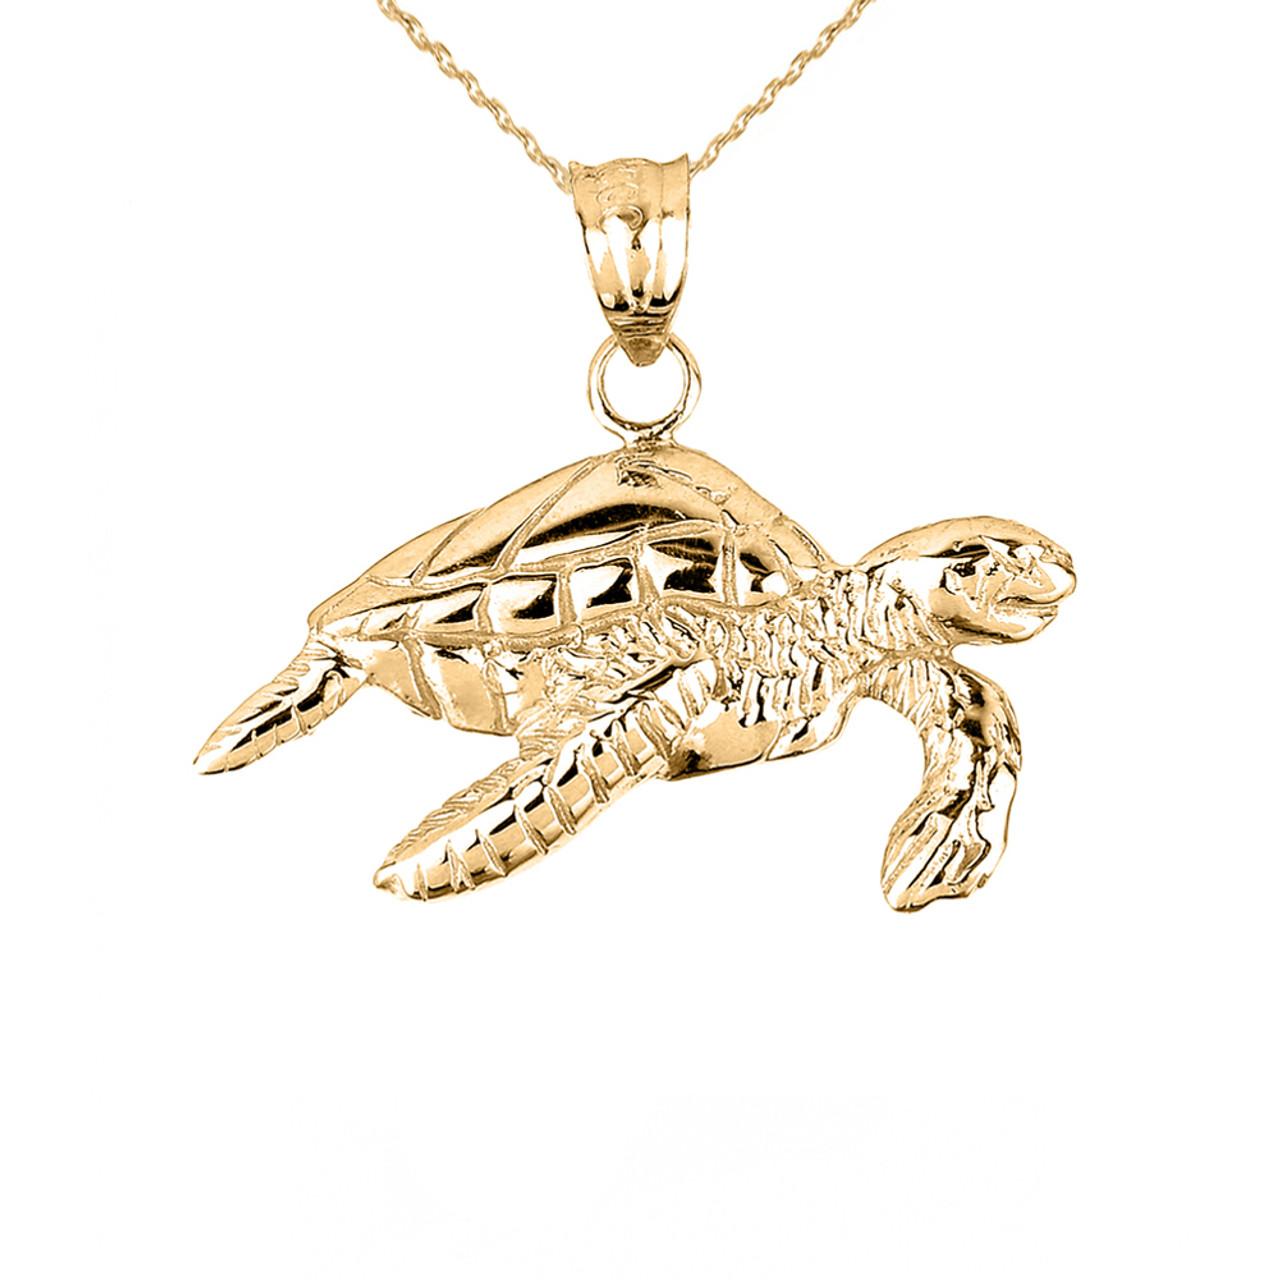 Solid 14K Yellow Gold Textured Alligator Charm Animal Pendant with High Polish